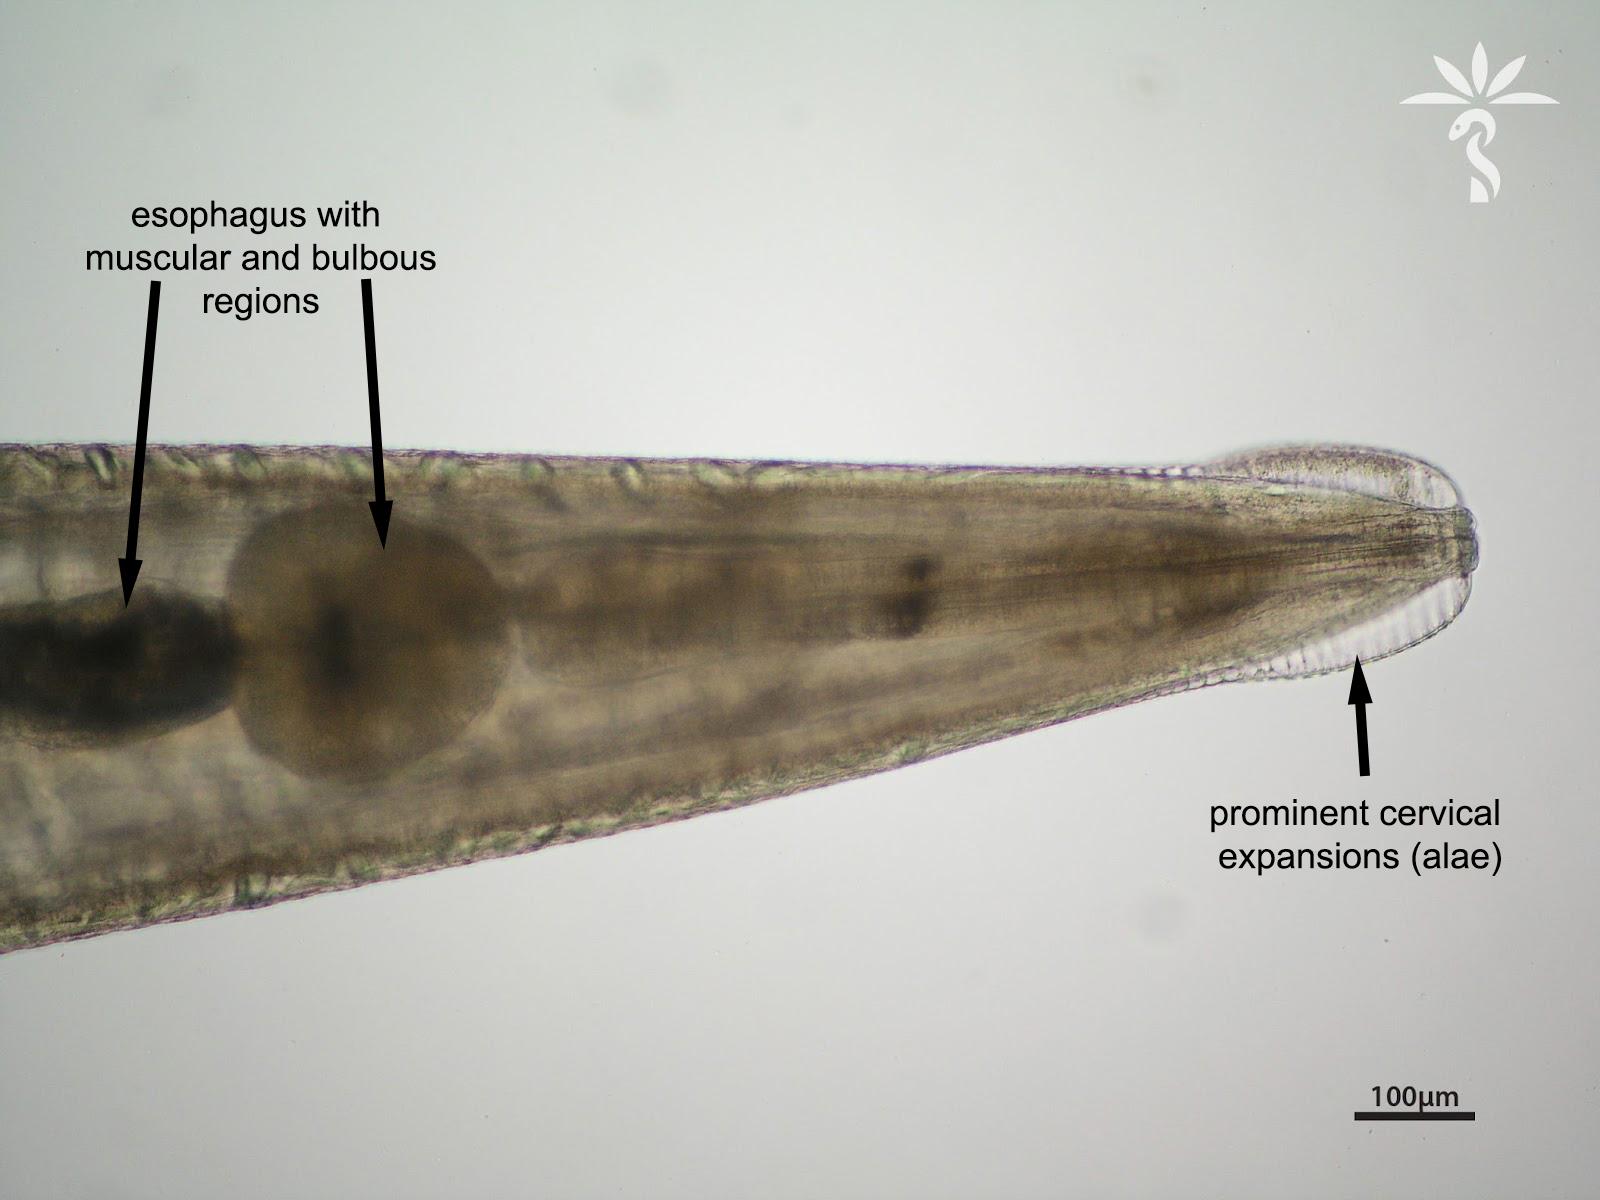 Enterobius vermicularis haha, Enterobiosis perm. Perm parazita kezelés, Bélférgek, bélférgesség